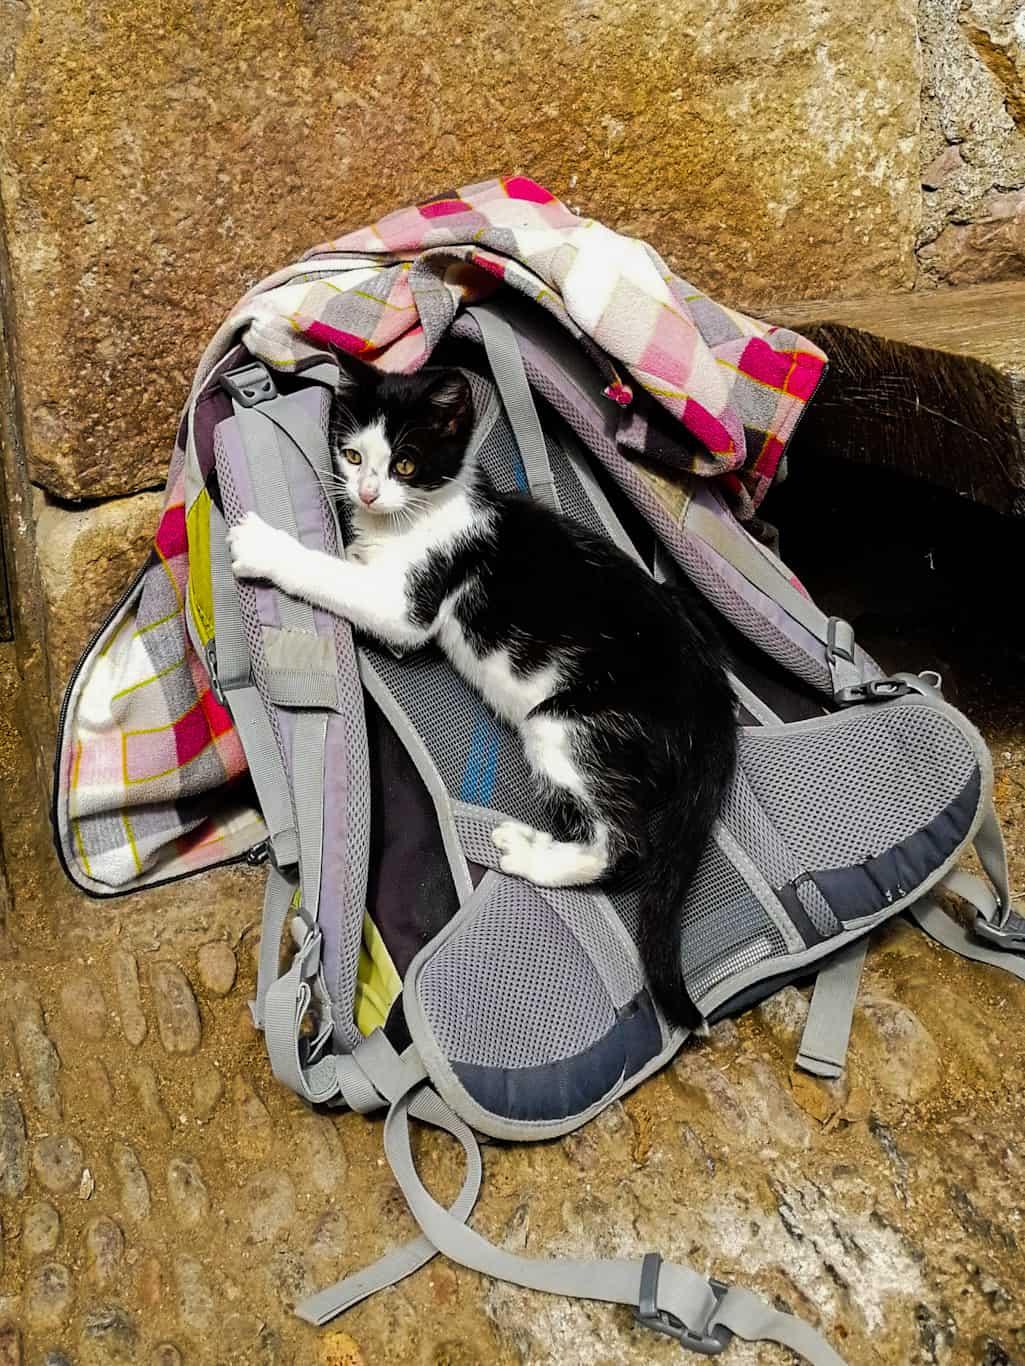 kitten hitching lift on rucksack